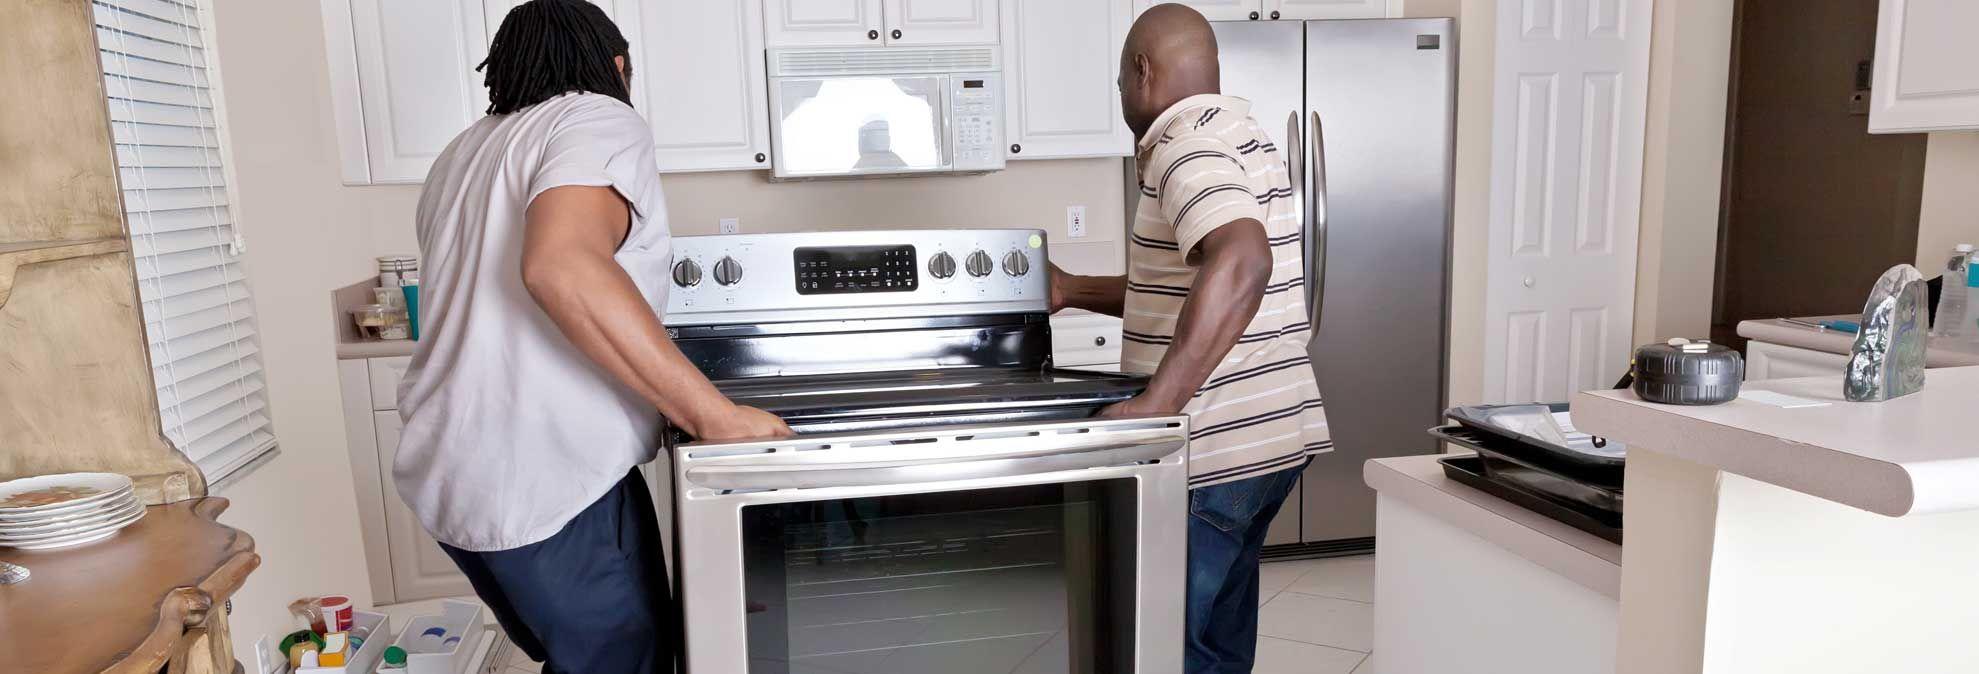 Kitchen Ventilation Best Appliances Appliances Kitchen Ventilation